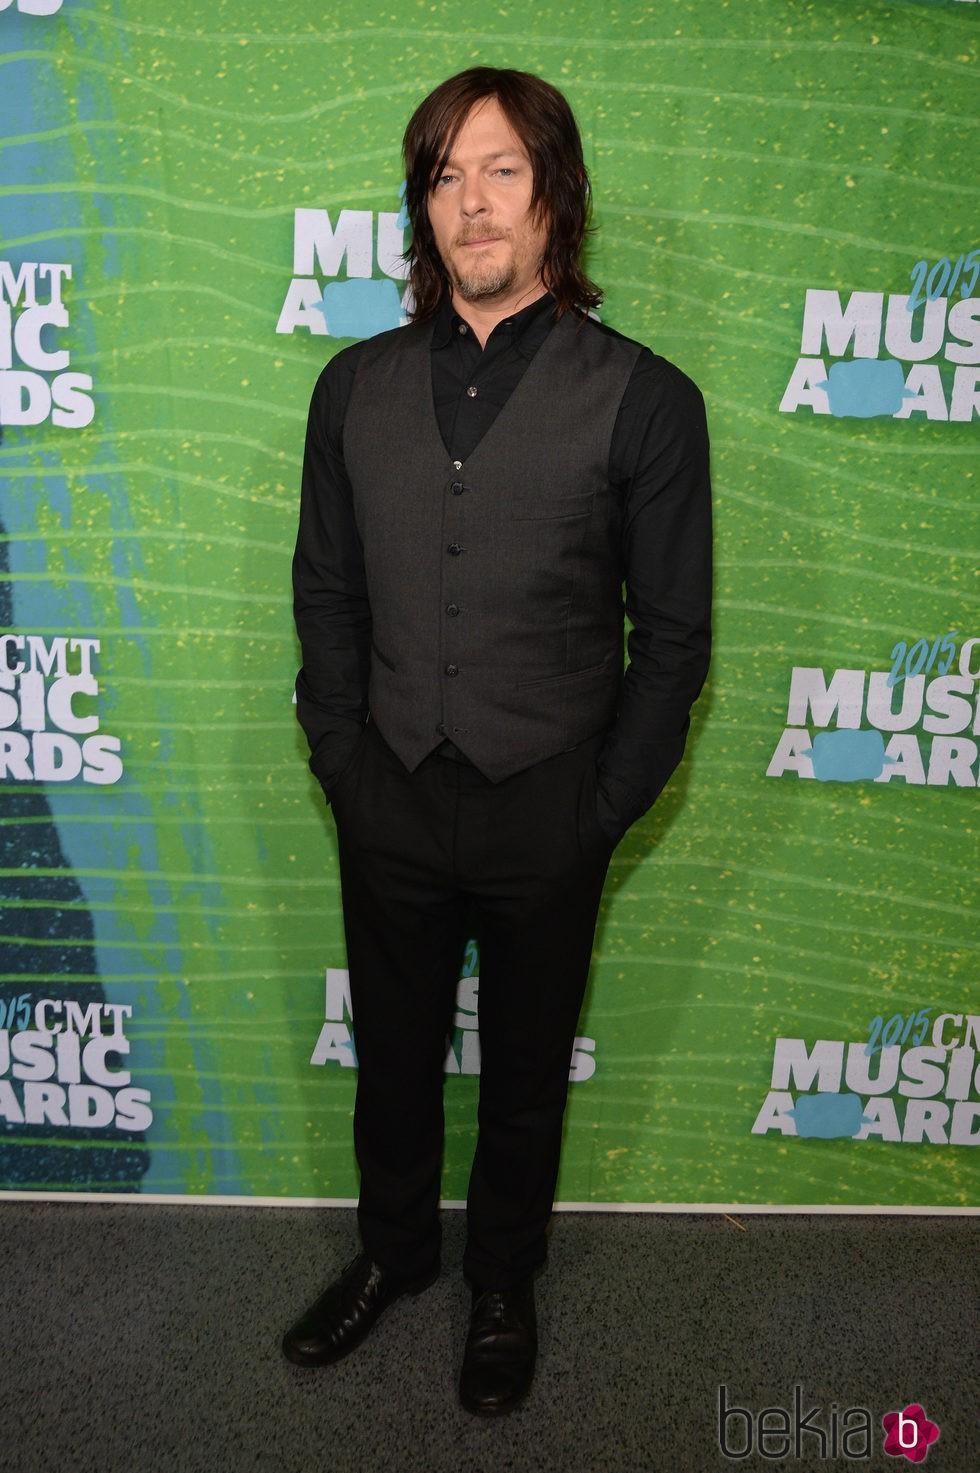 Norman Reedus en los CMT Music Awards 2015